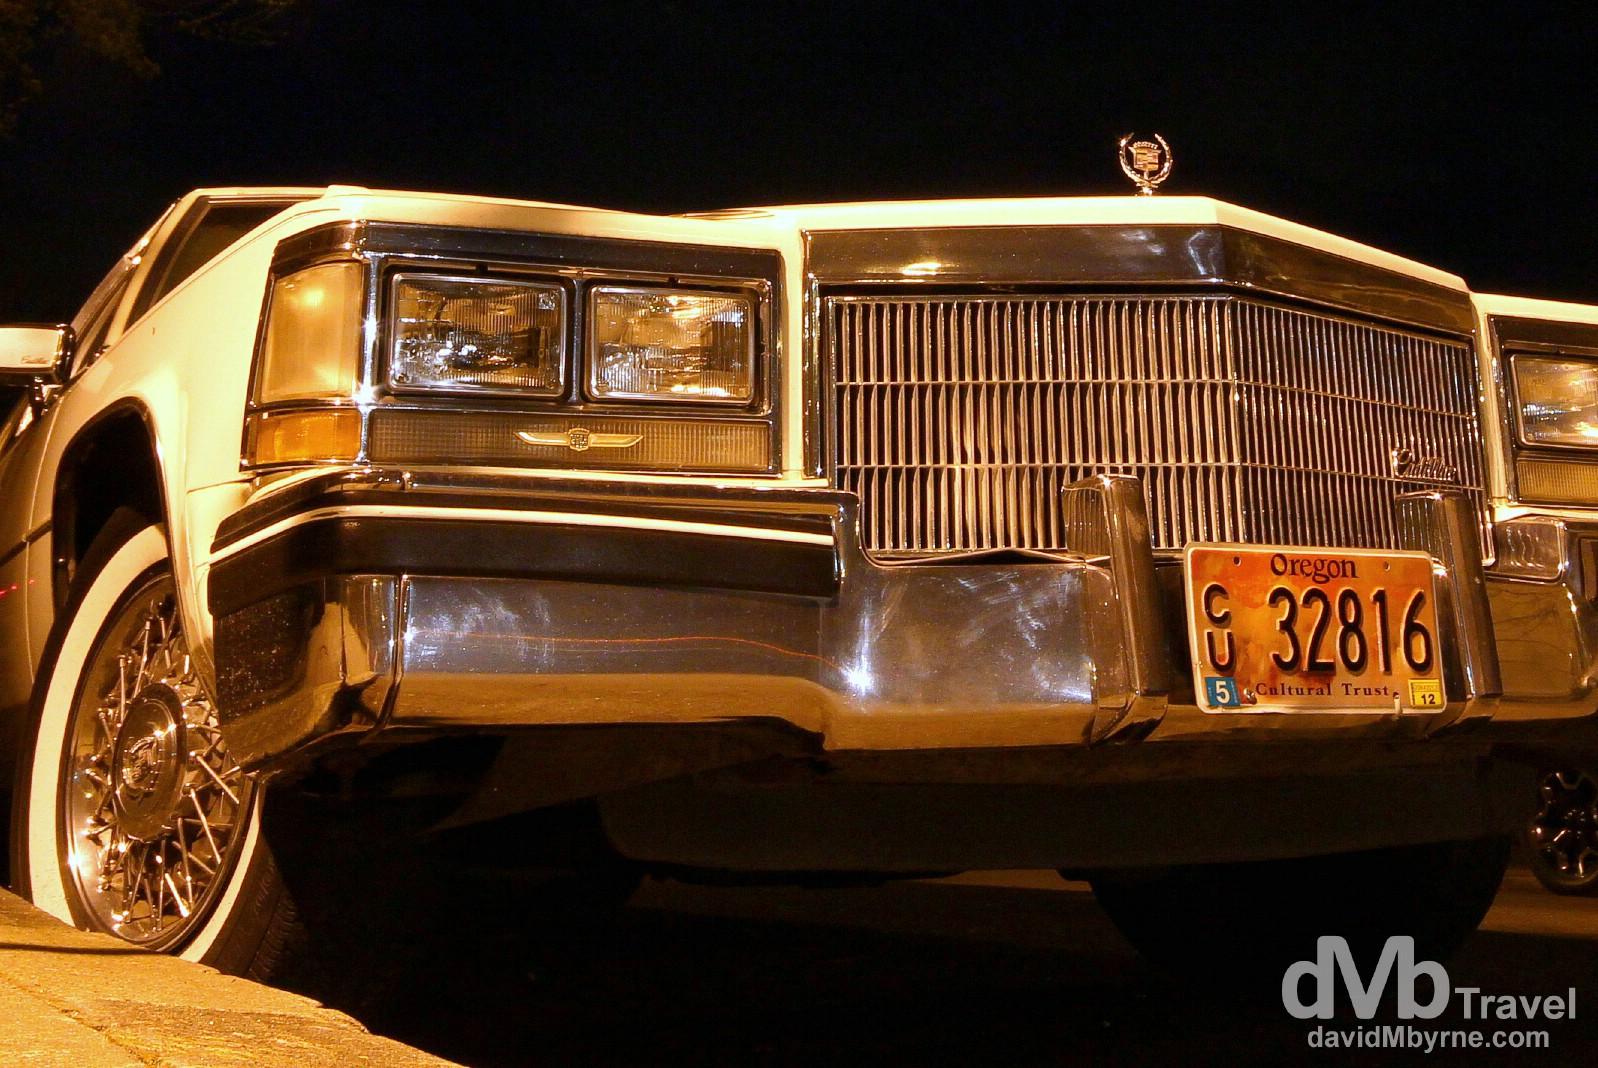 A Cadillac off Alberta street in the Alberta Arts District in Portland, Oregon, USA. March 28, 2013.